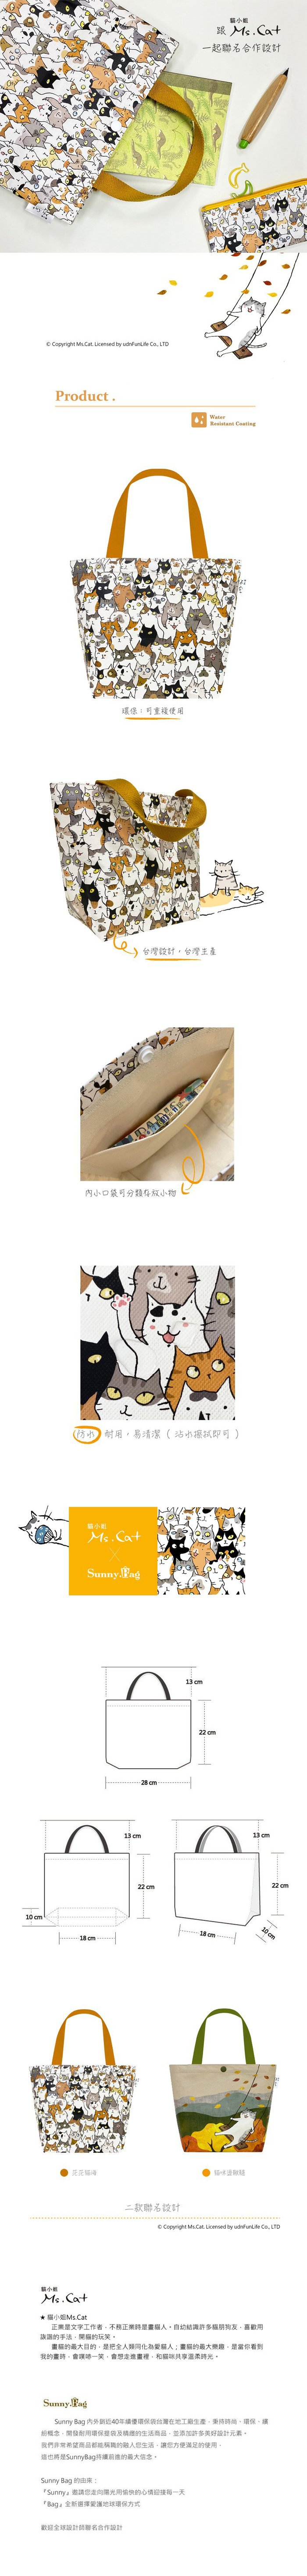 Sunny Bag x 貓小姐Ms.Cat-托特包_茫茫貓海